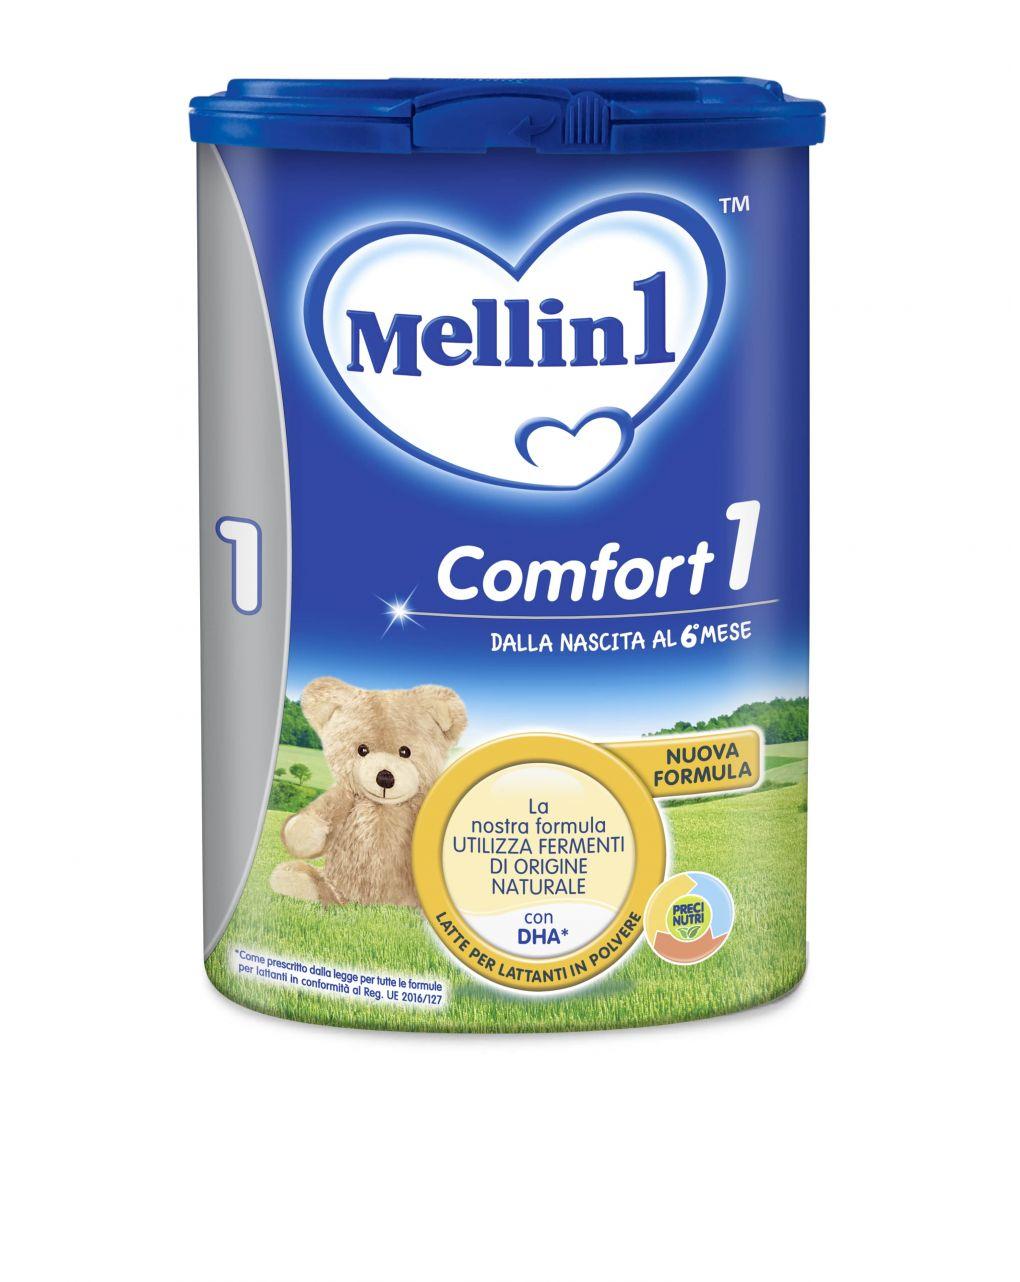 Mellin - latte mellin comfort 1 polvere 800 gr - Mellin